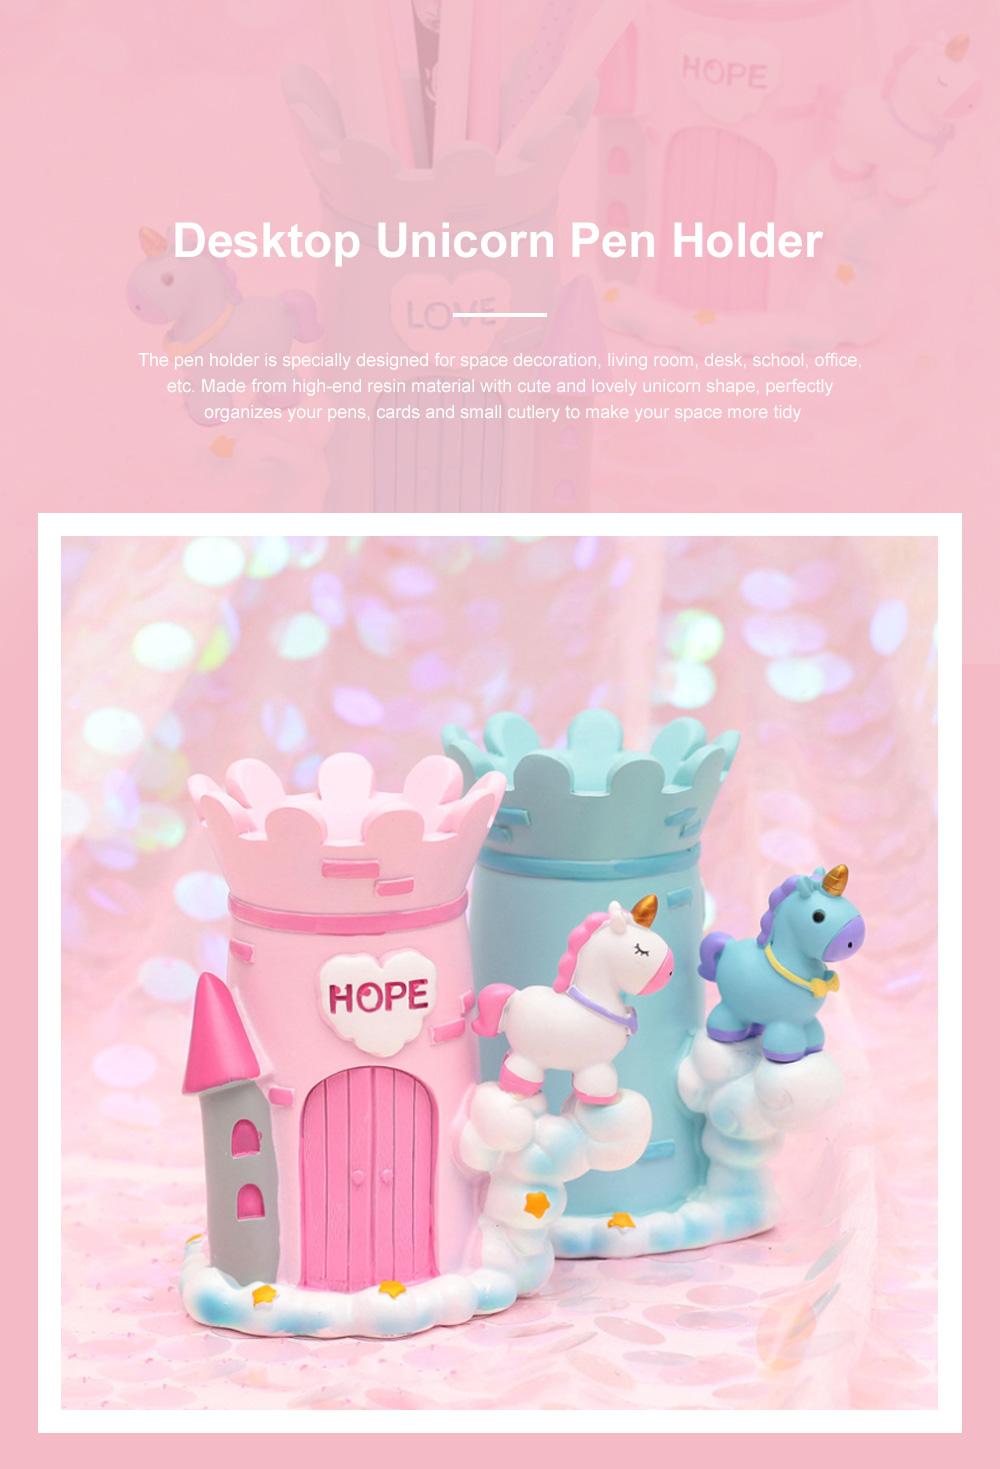 Unicorn Pen Holder for Desktop Desk Office Home School Girls School Supplies Accessories Resin Brush Container Pencil Container Brush Holder 0